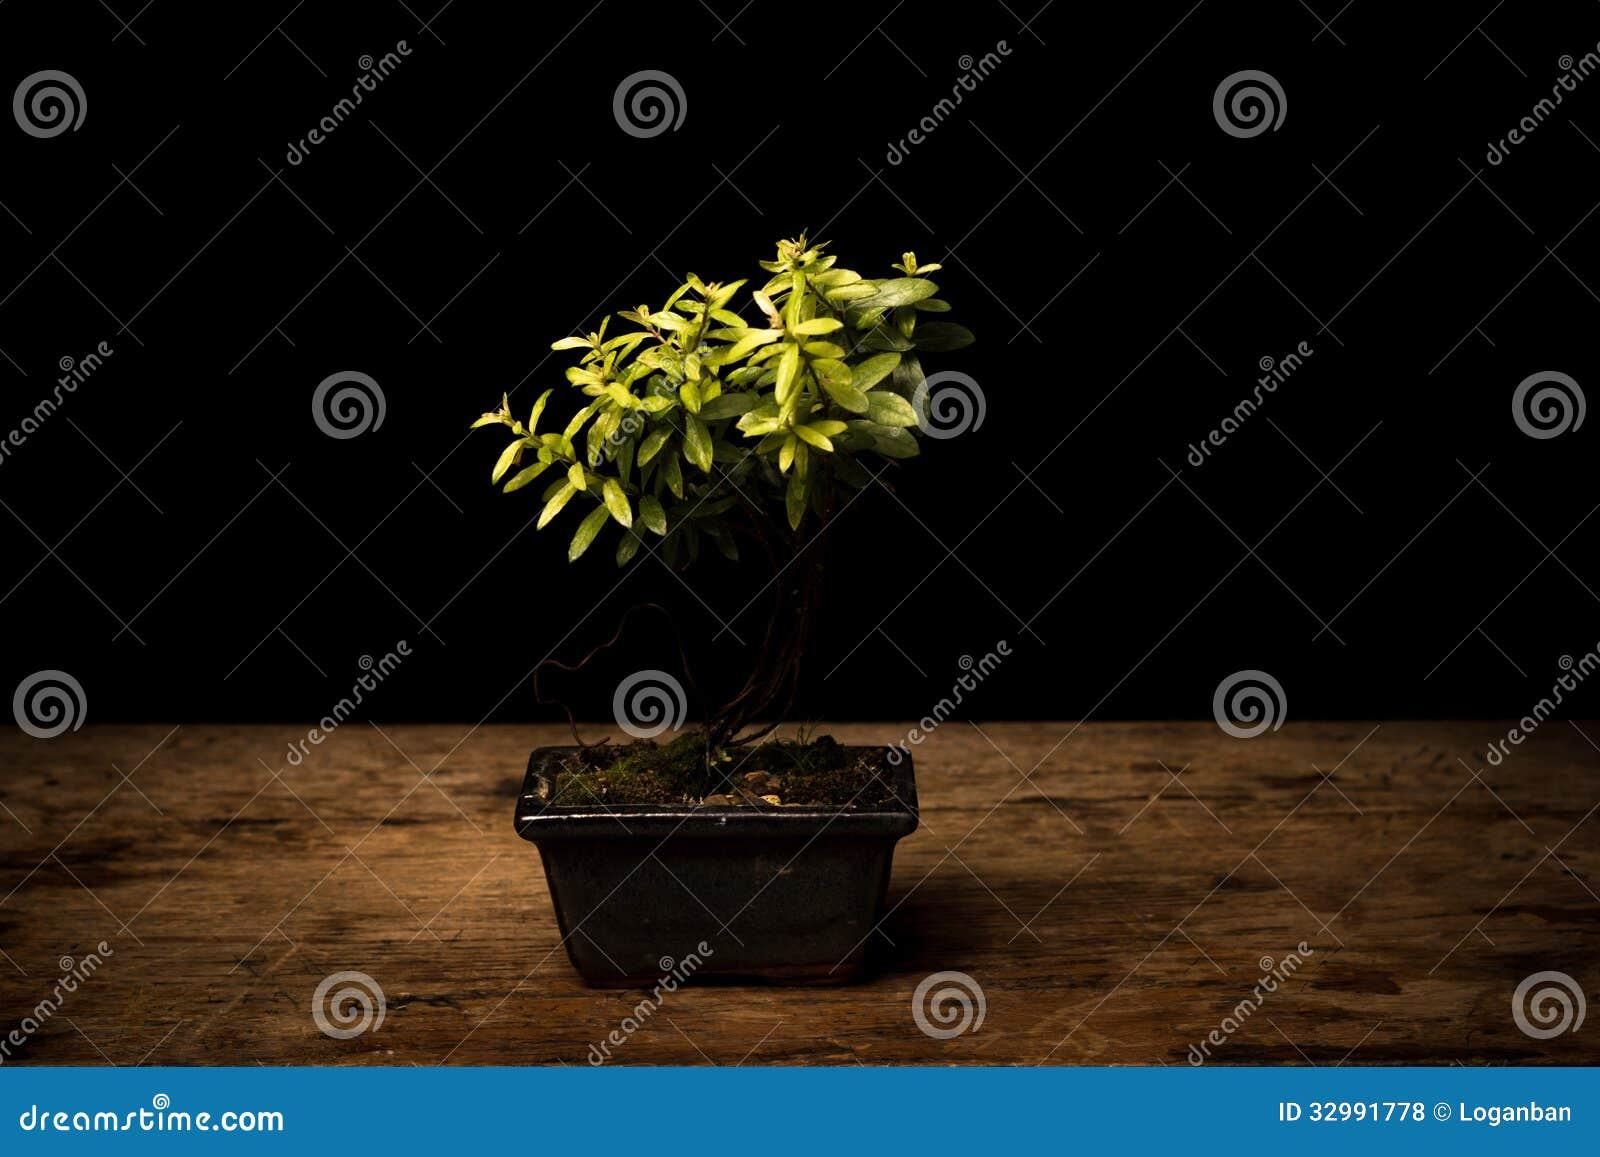 Small bonsai tree in ceramic pot